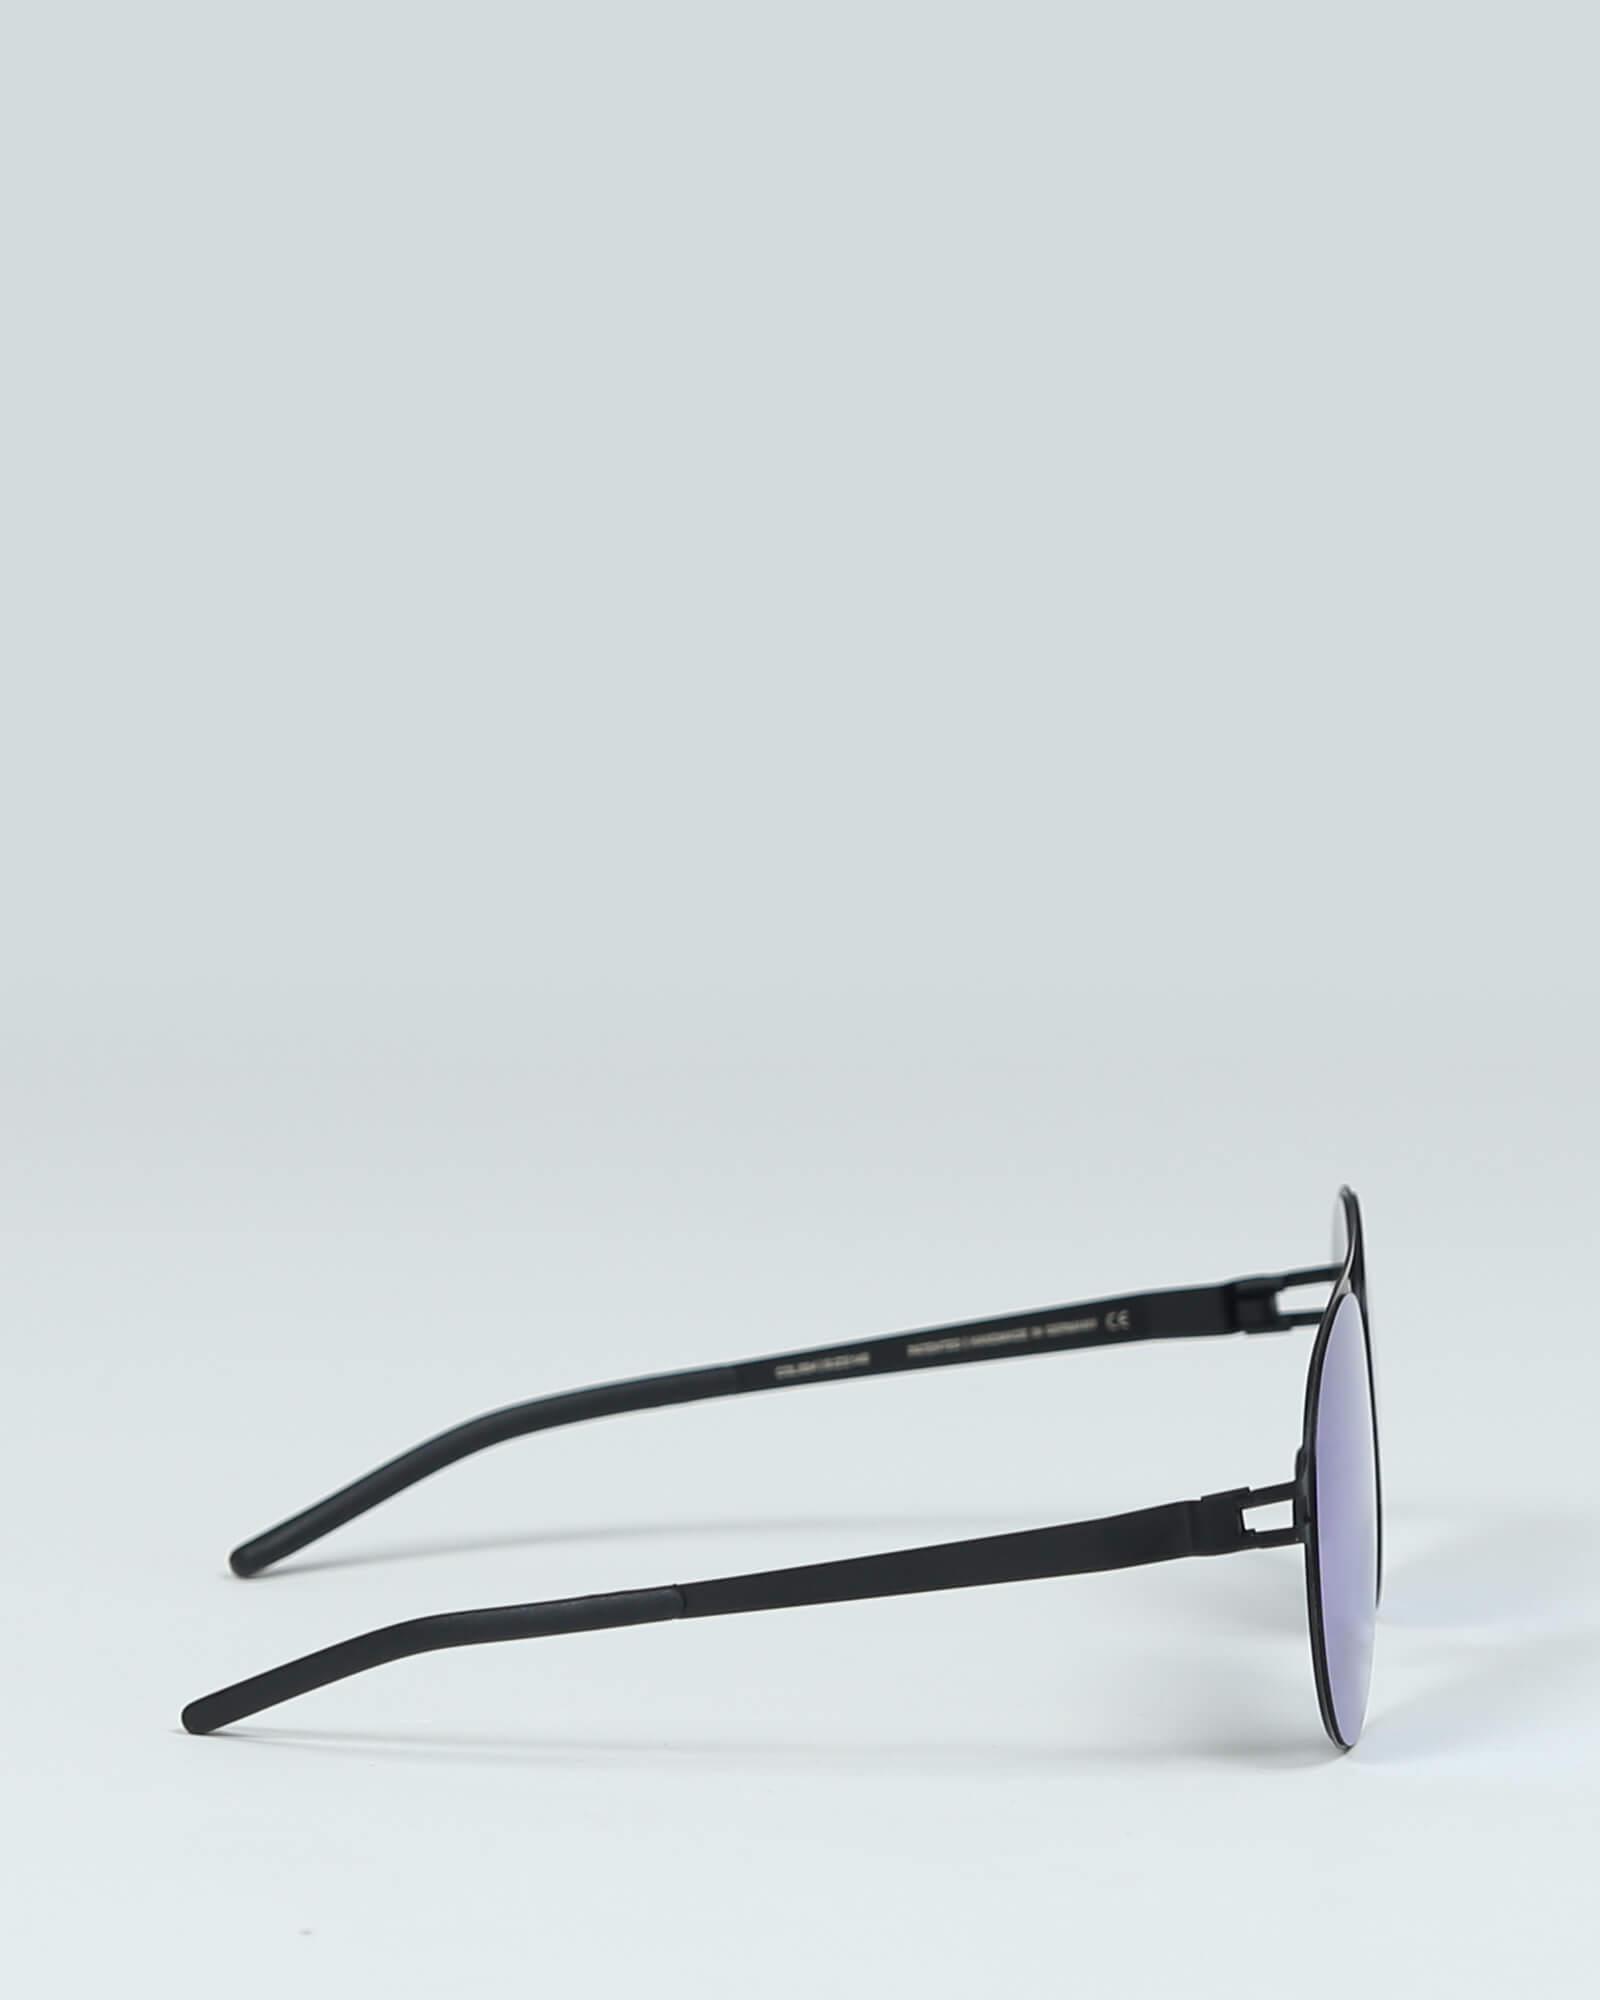 sunglass-3